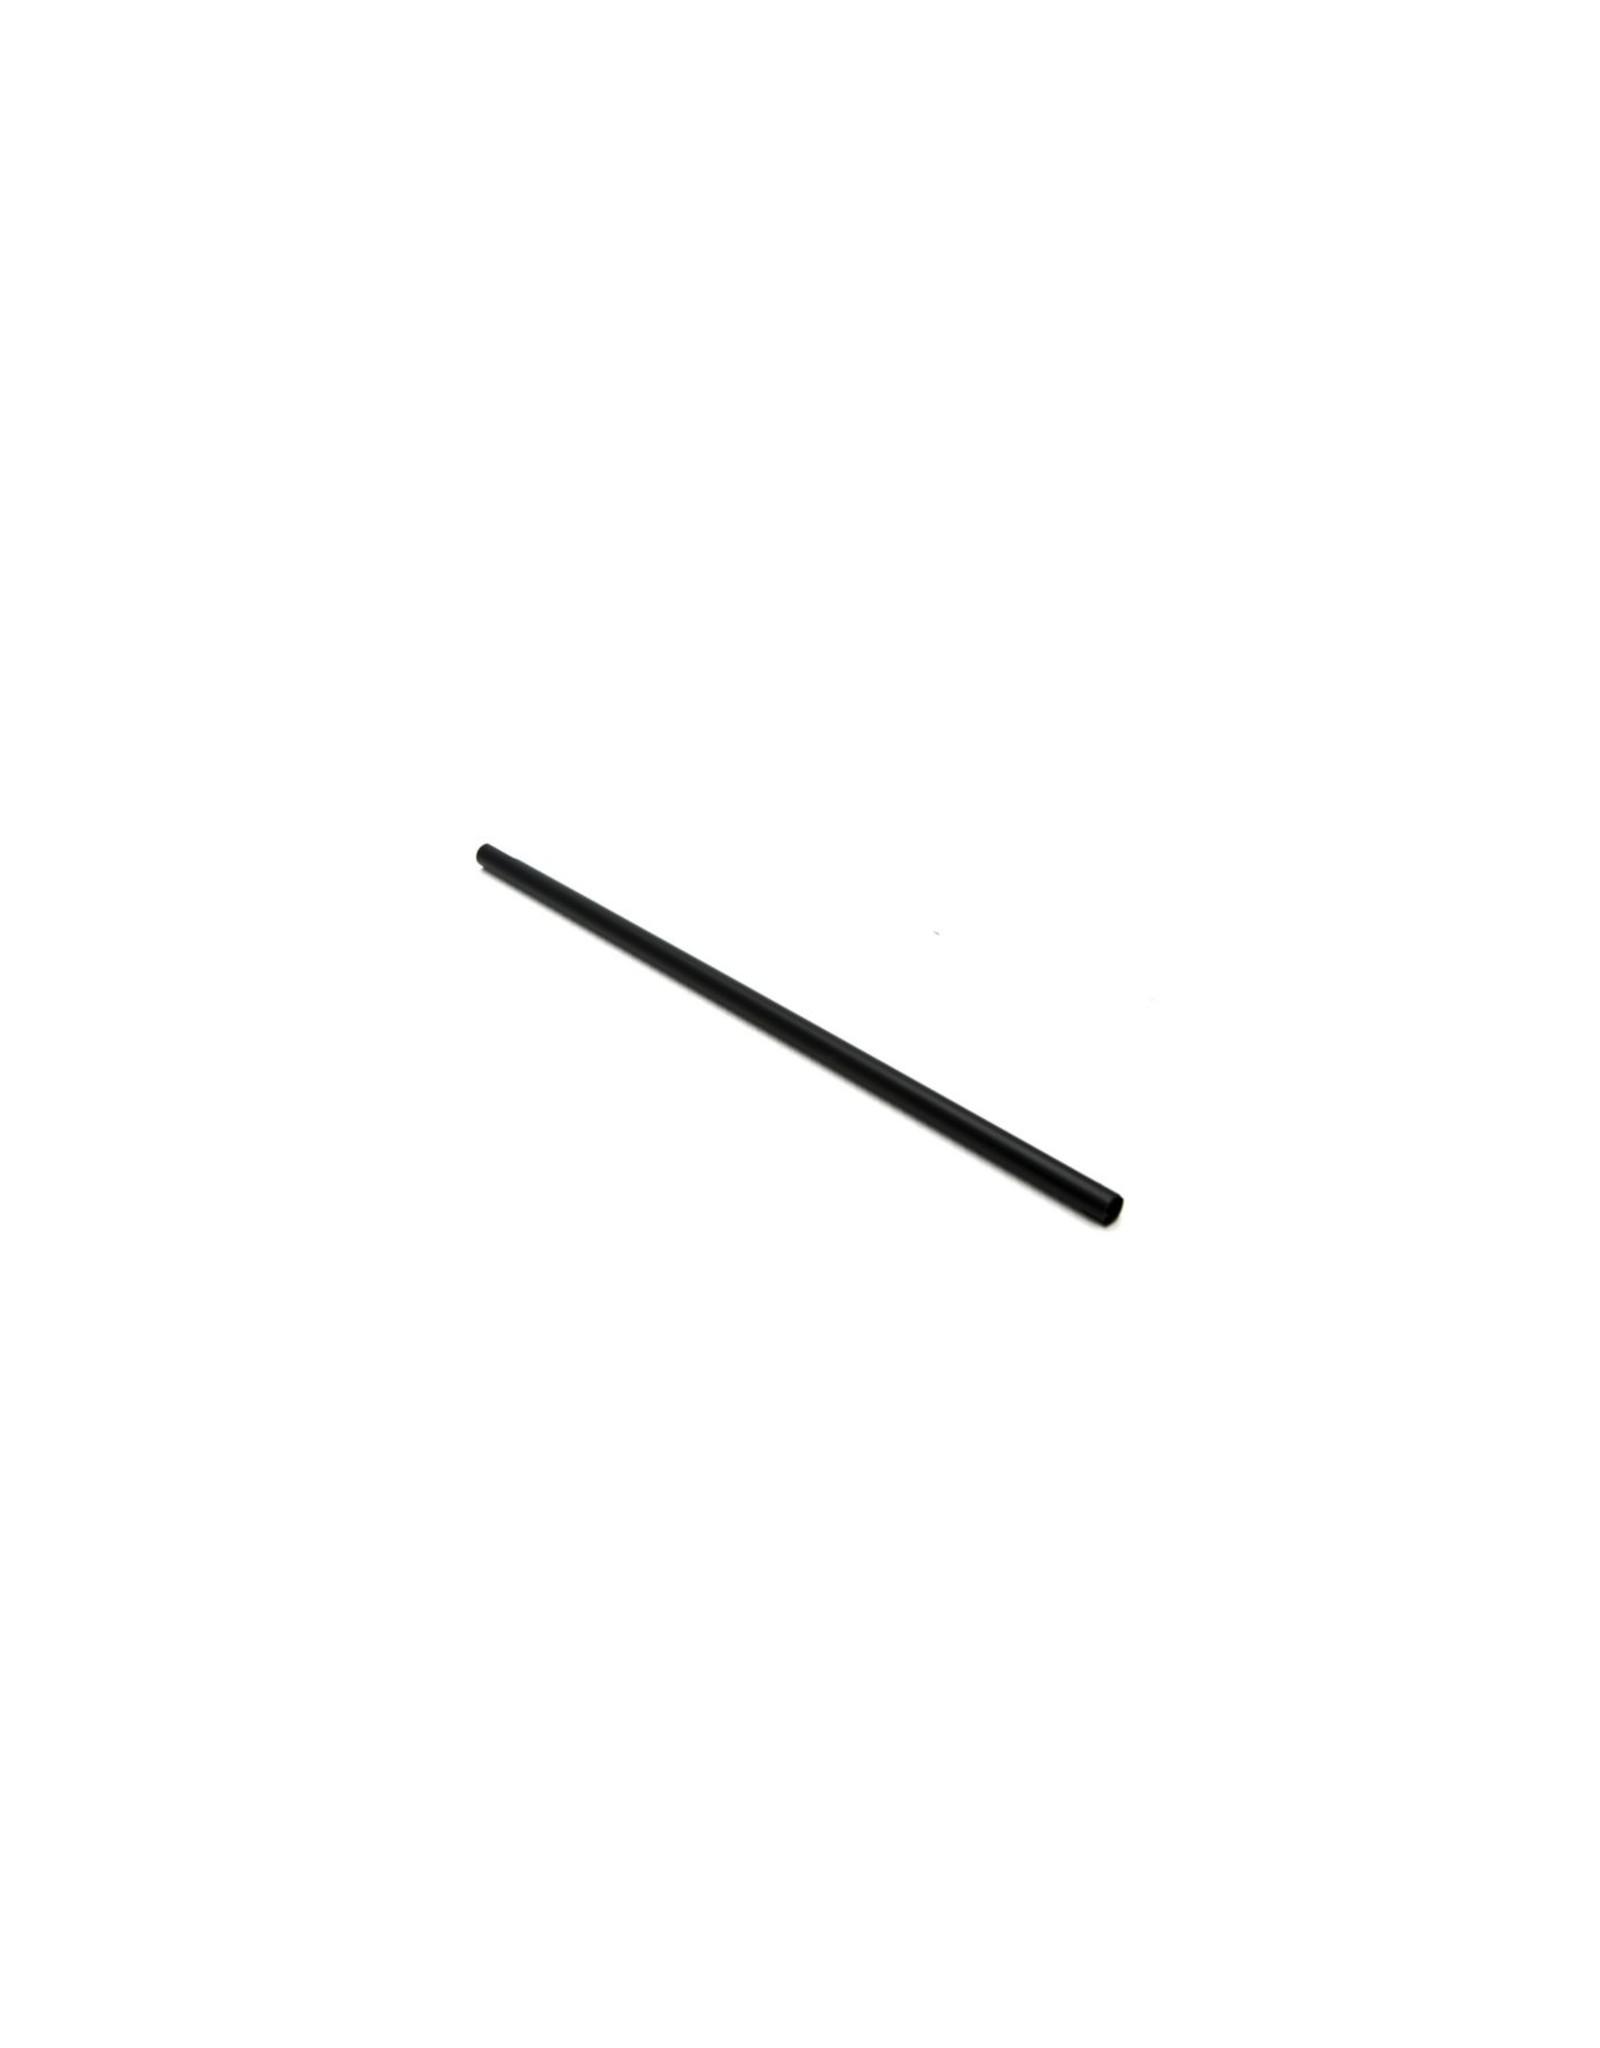 Blade 1512 - Tail Boom: Blade 230 S